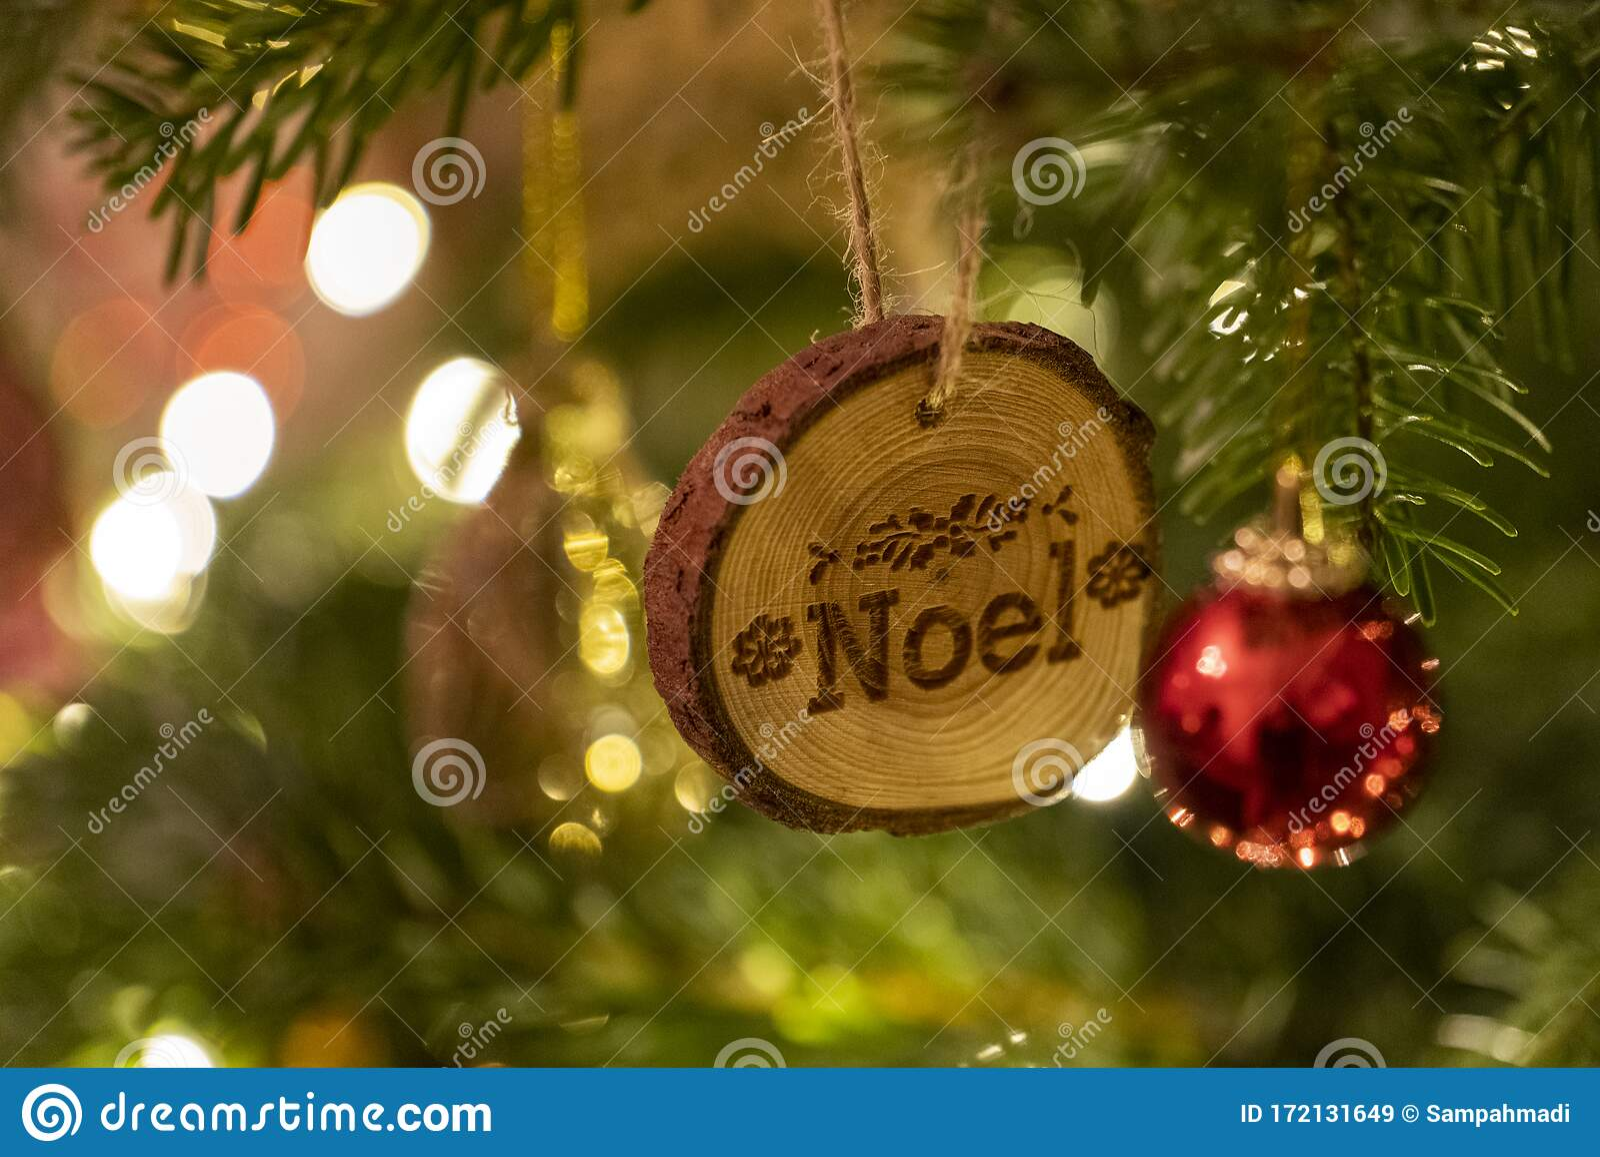 Rustic Christmas Tree Decoration Saying Noel Stock Image Image Of Illuminations Garland 172131649